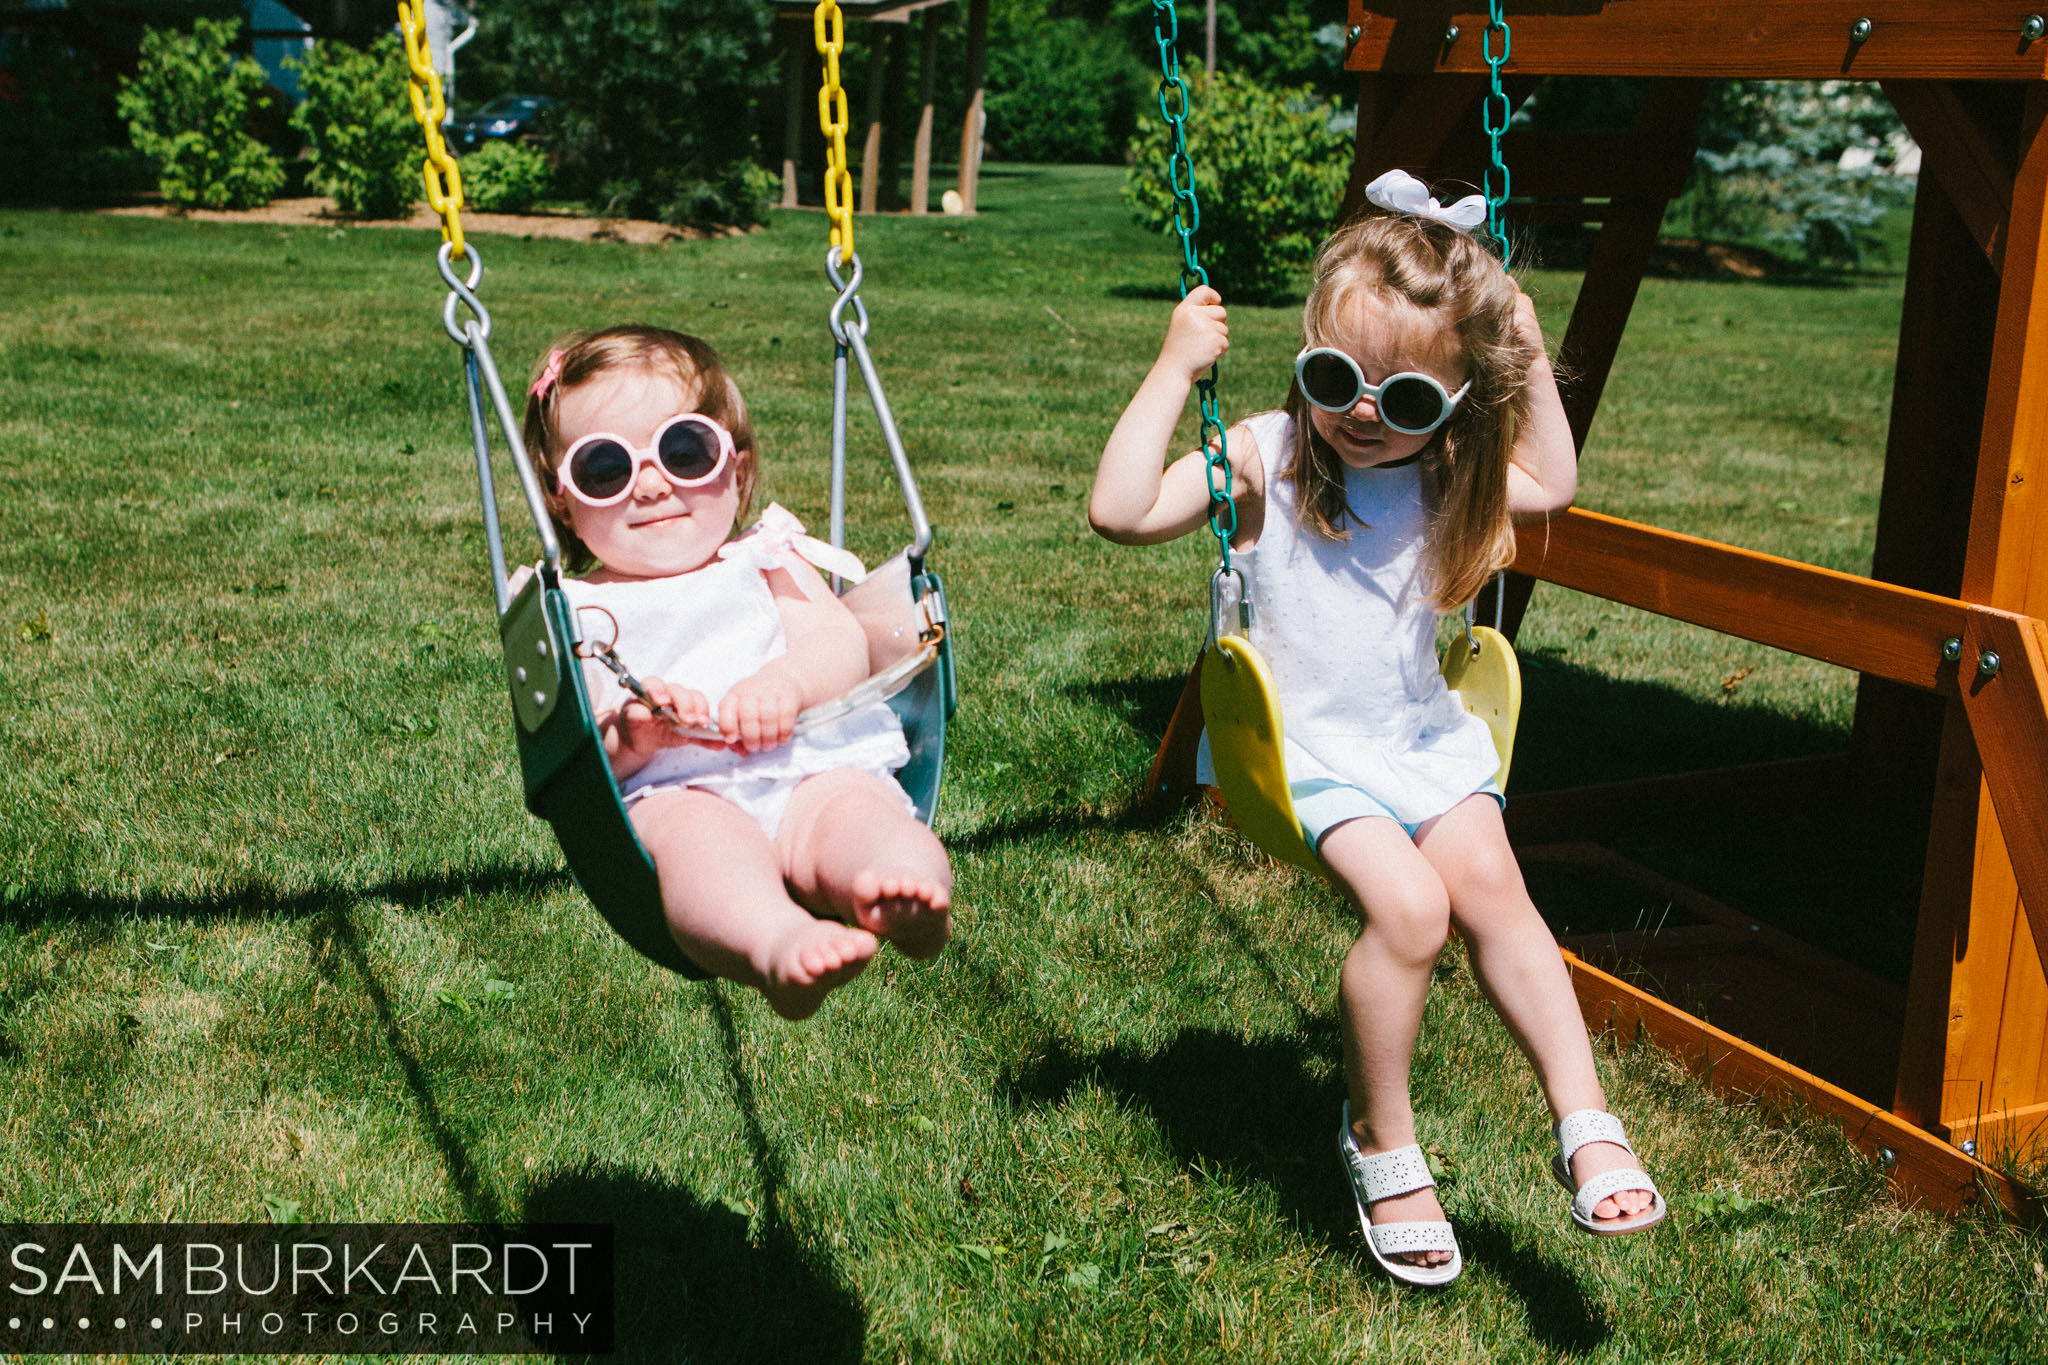 sburkardt_family_portraits_photoshoot_ridgefield_connecticut_summer_tea_party_009.jpg